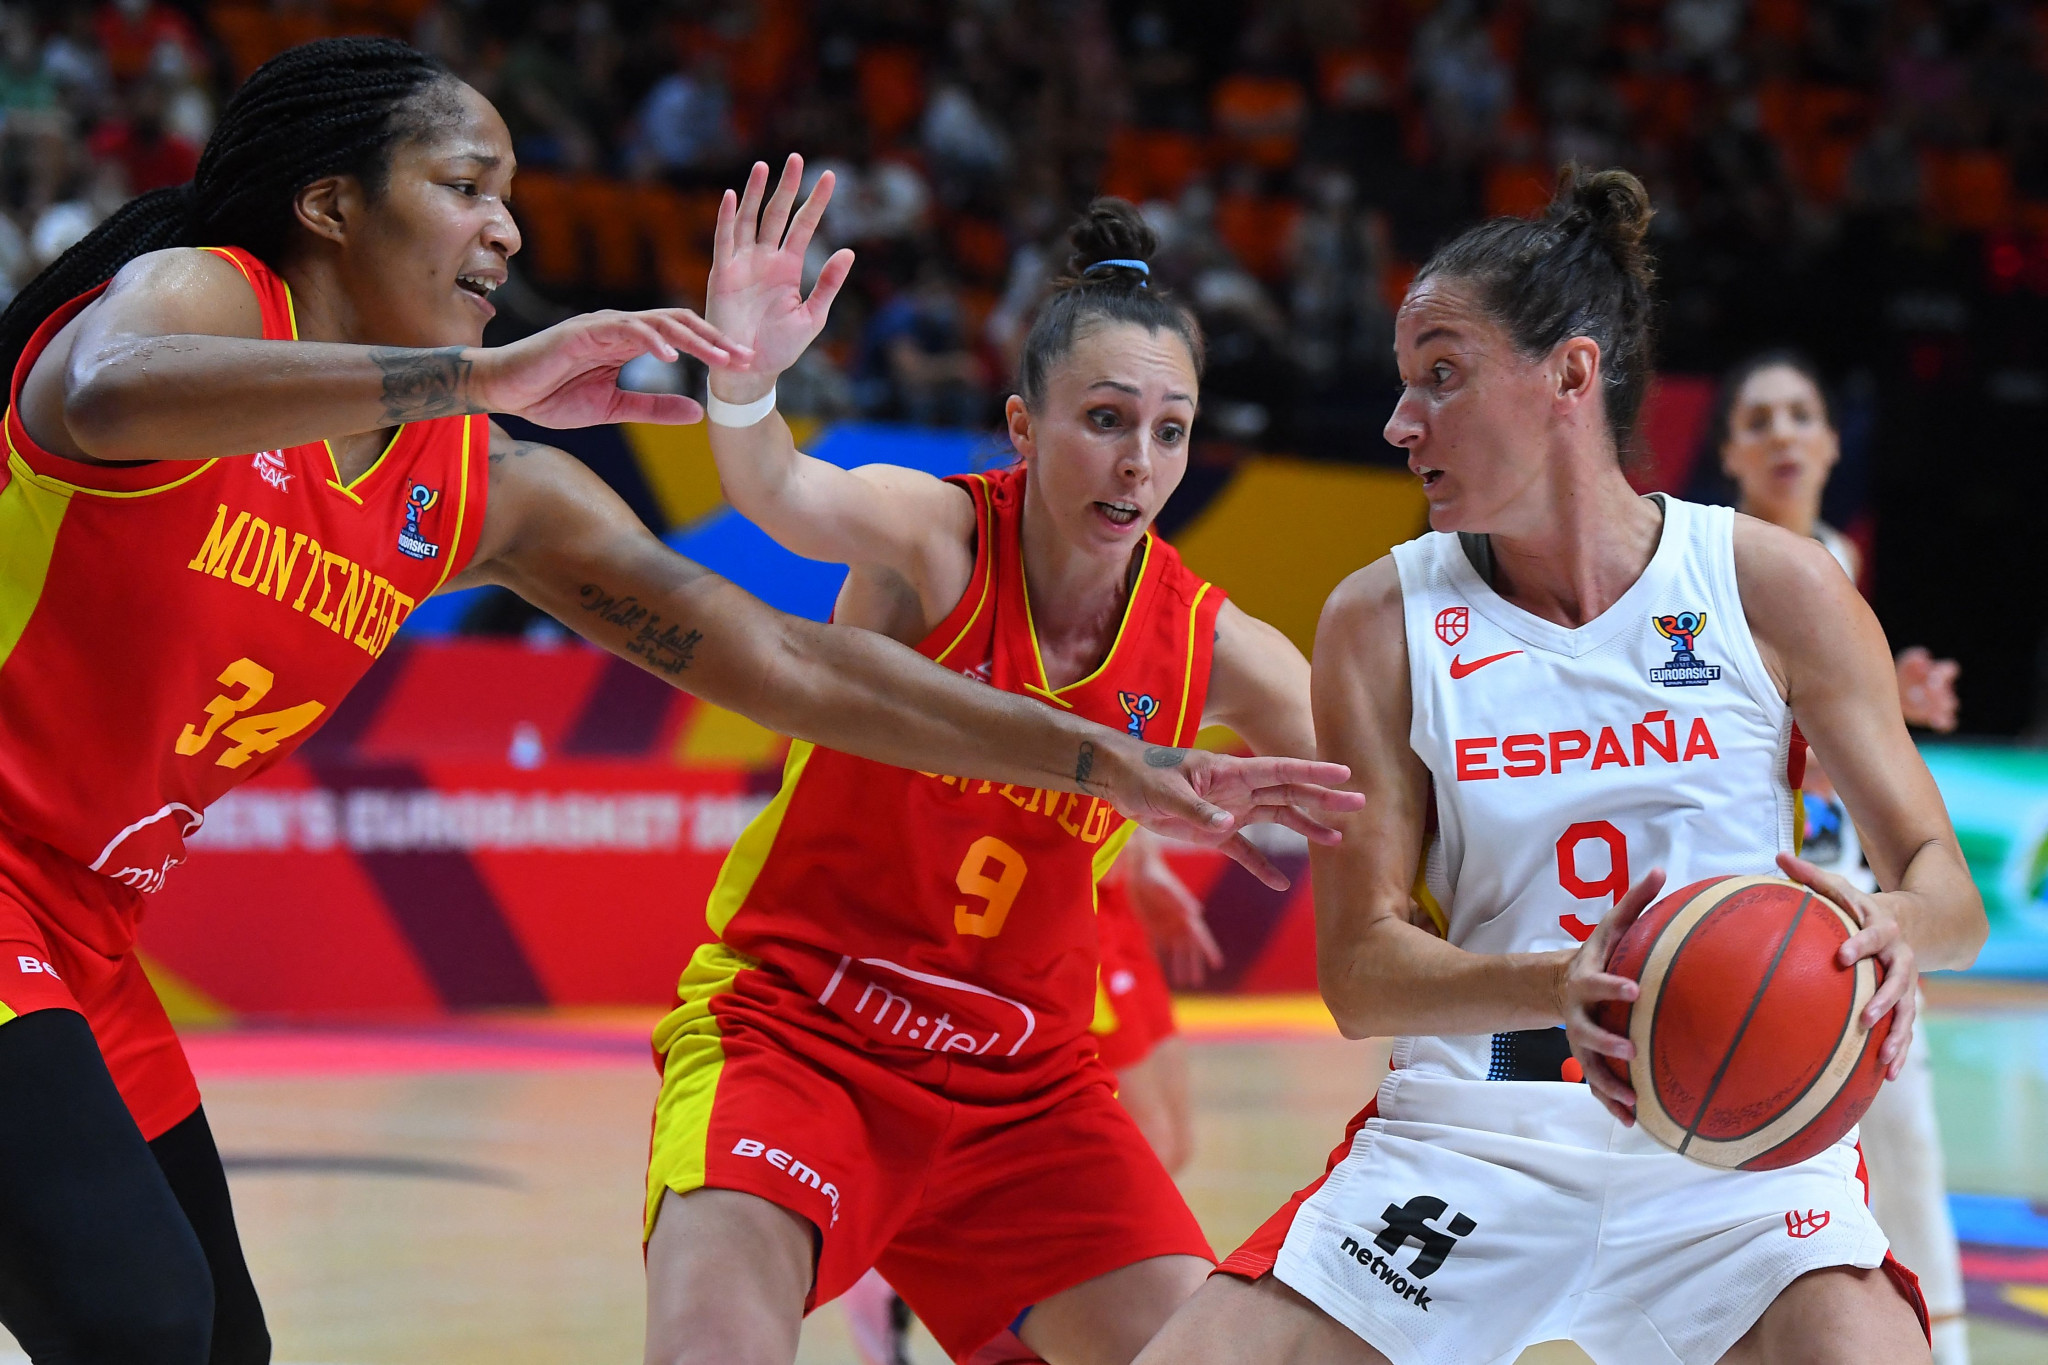 Women's EuroBasket quarter-final line-up confirmed following knockout round